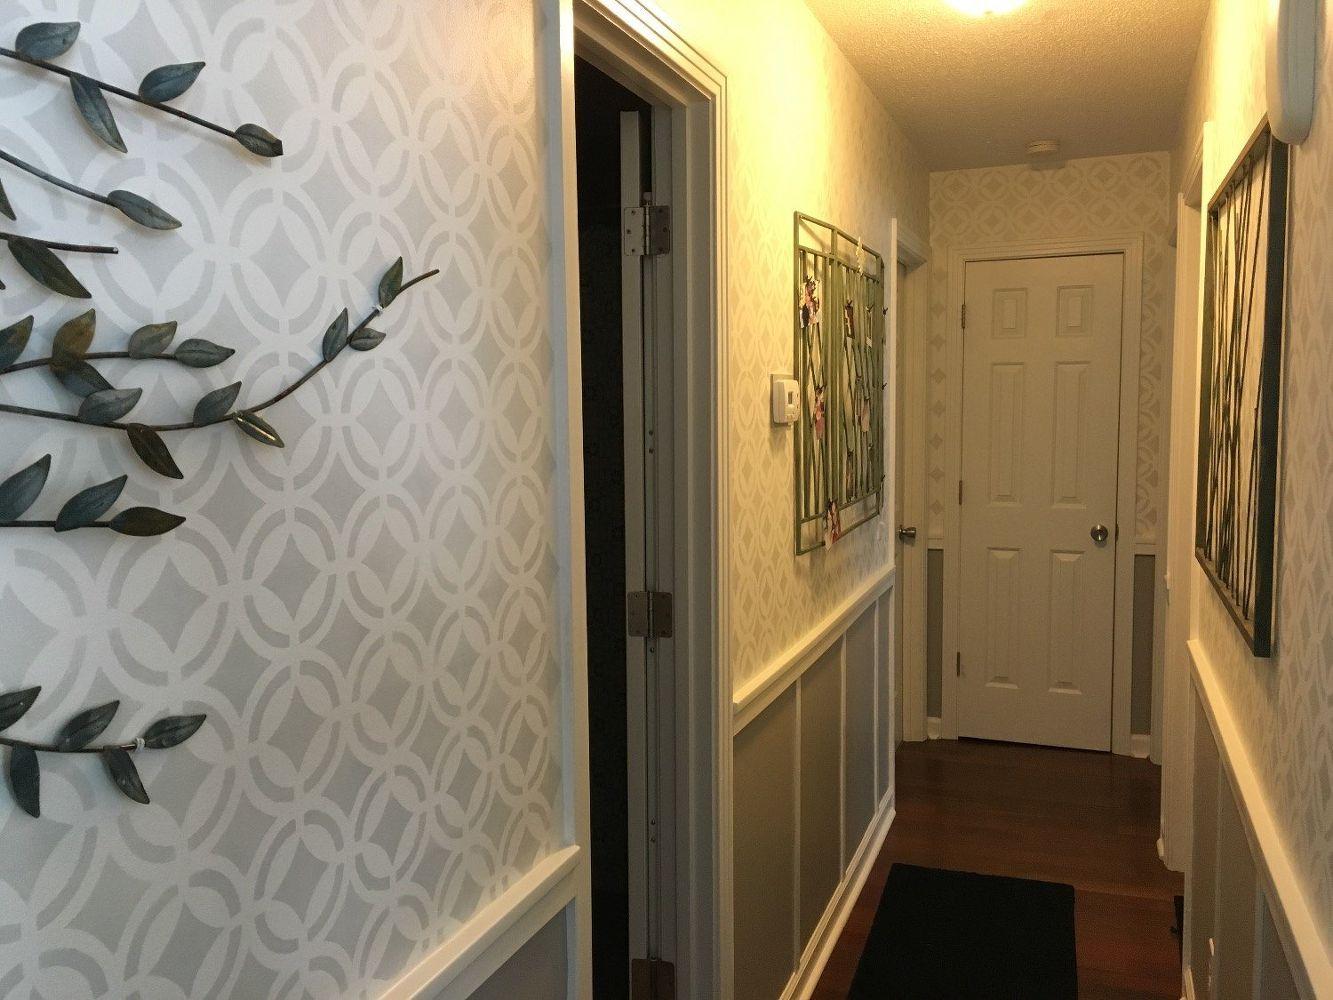 hallway finally. Stenciled Hallway Finally Finished, Wall Decor 0